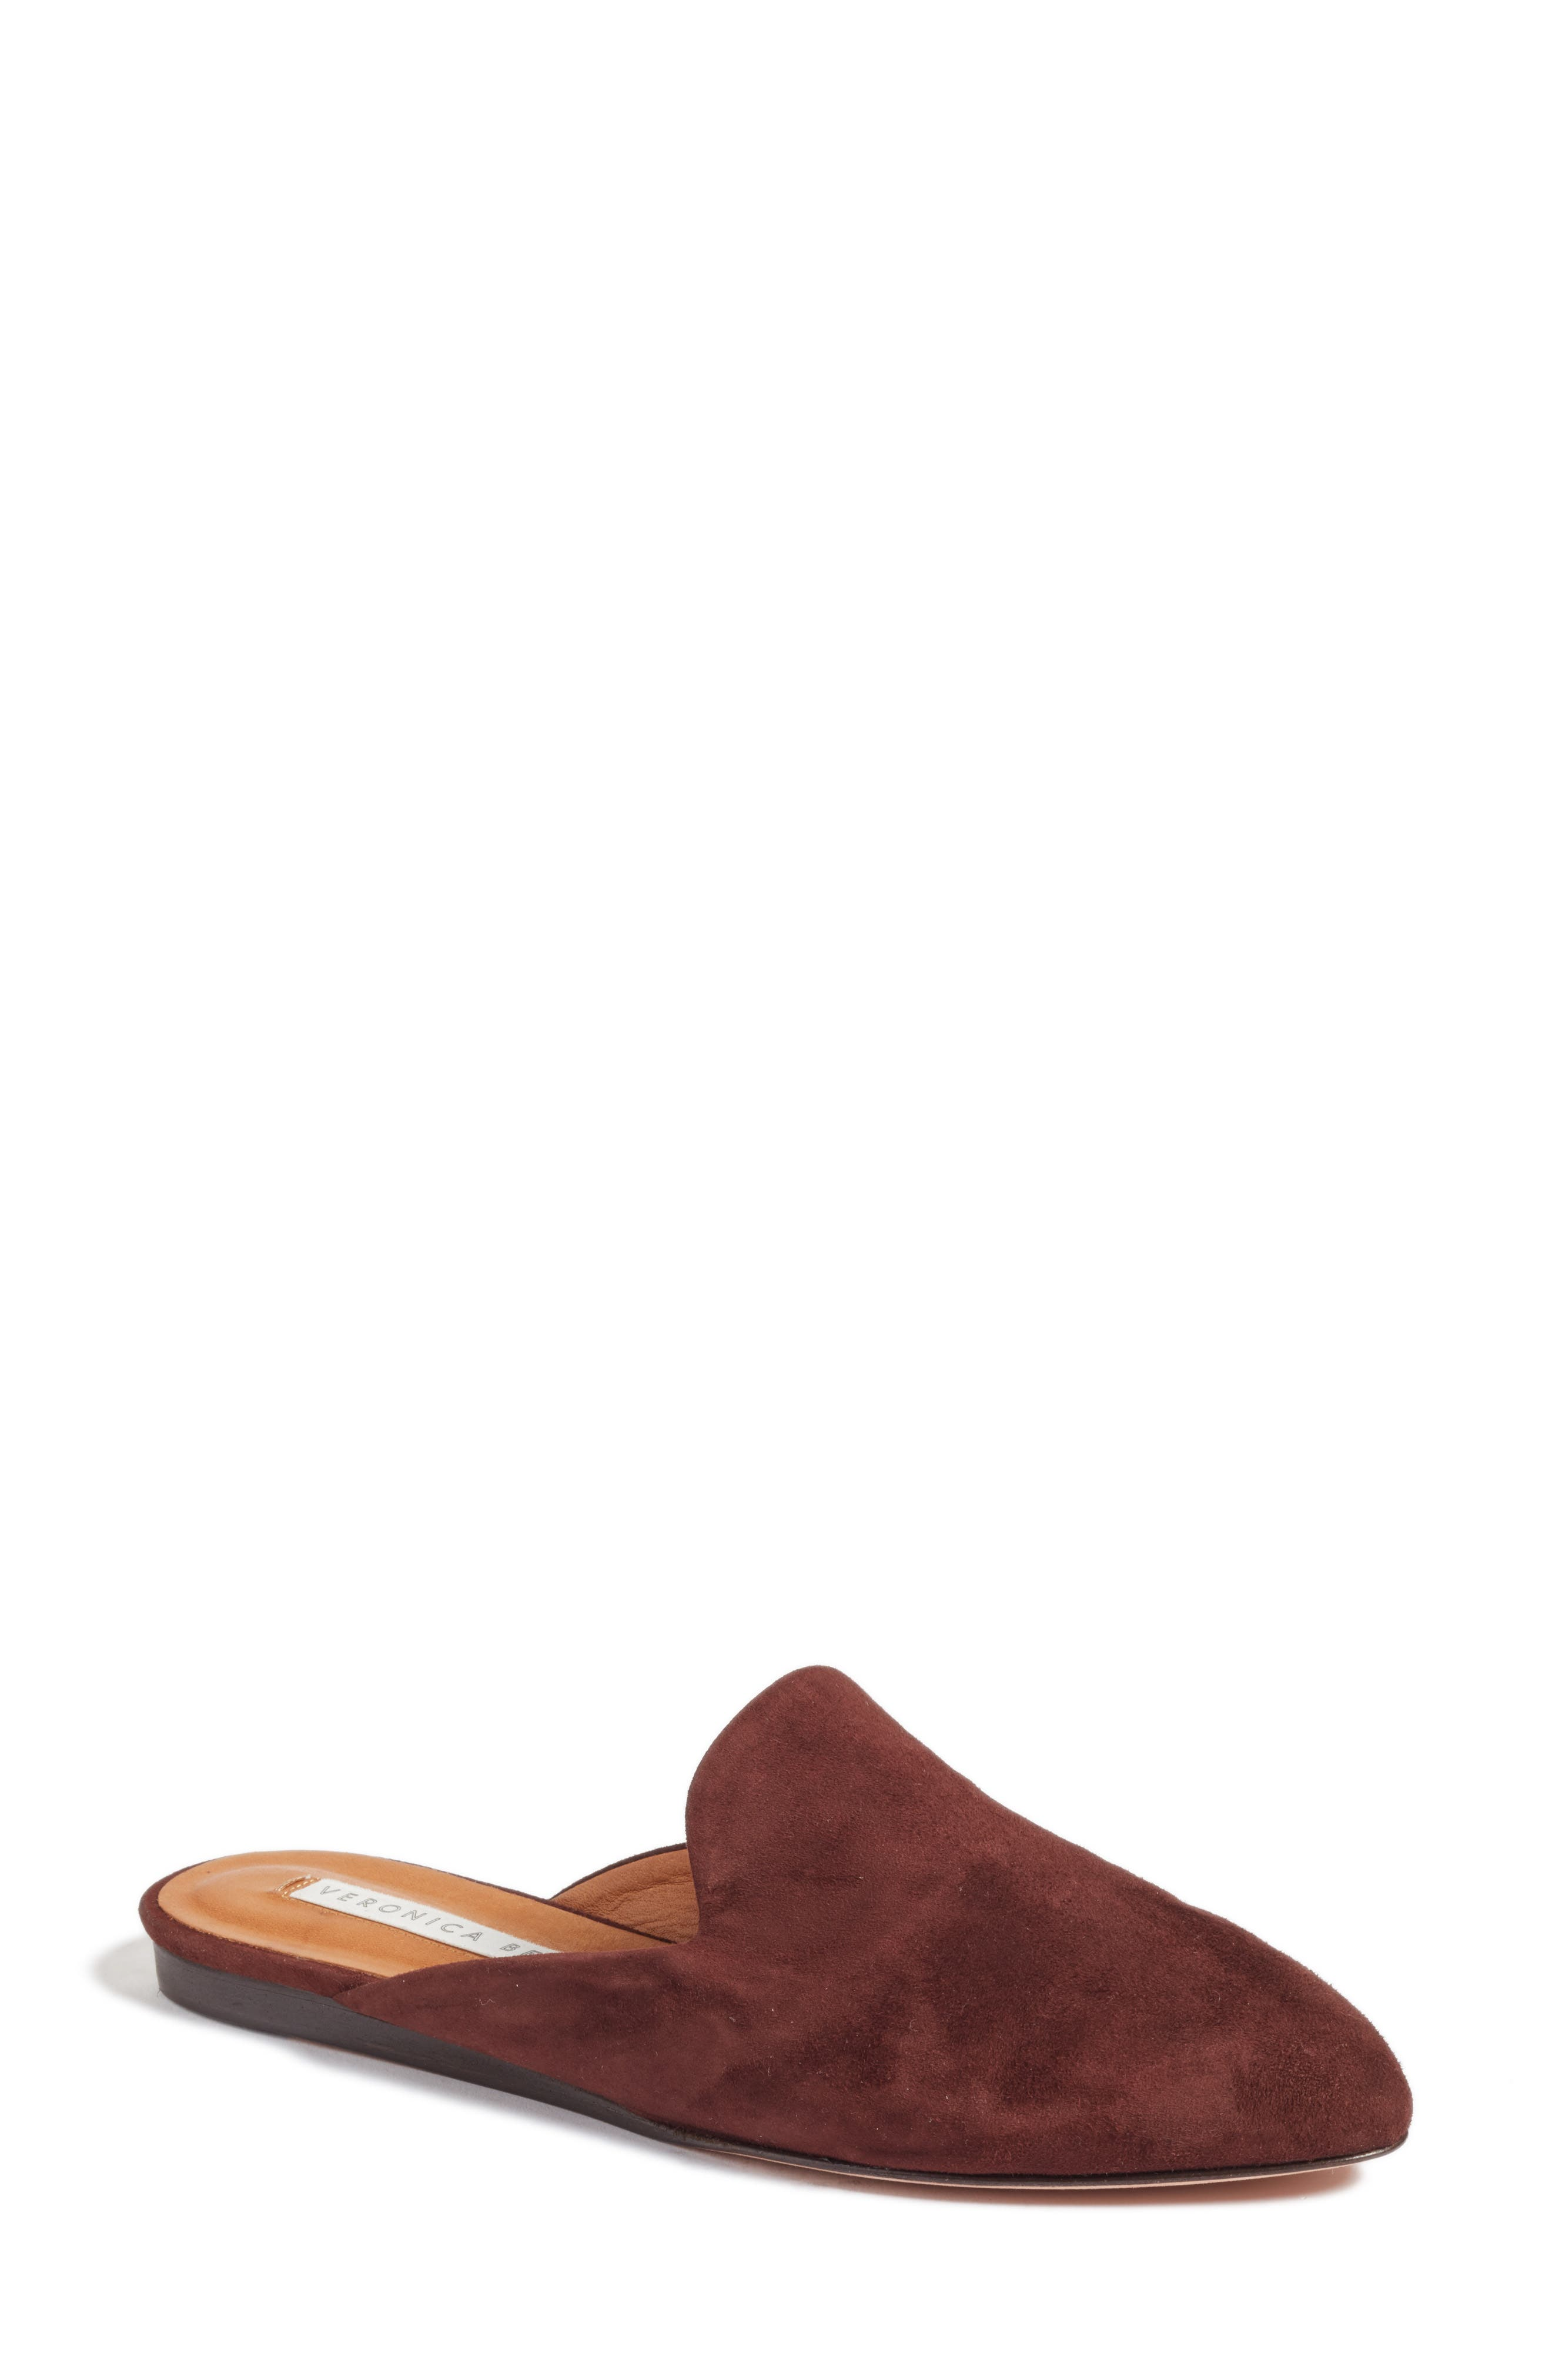 Veronica Beard Grey Backless Loafer (Women)